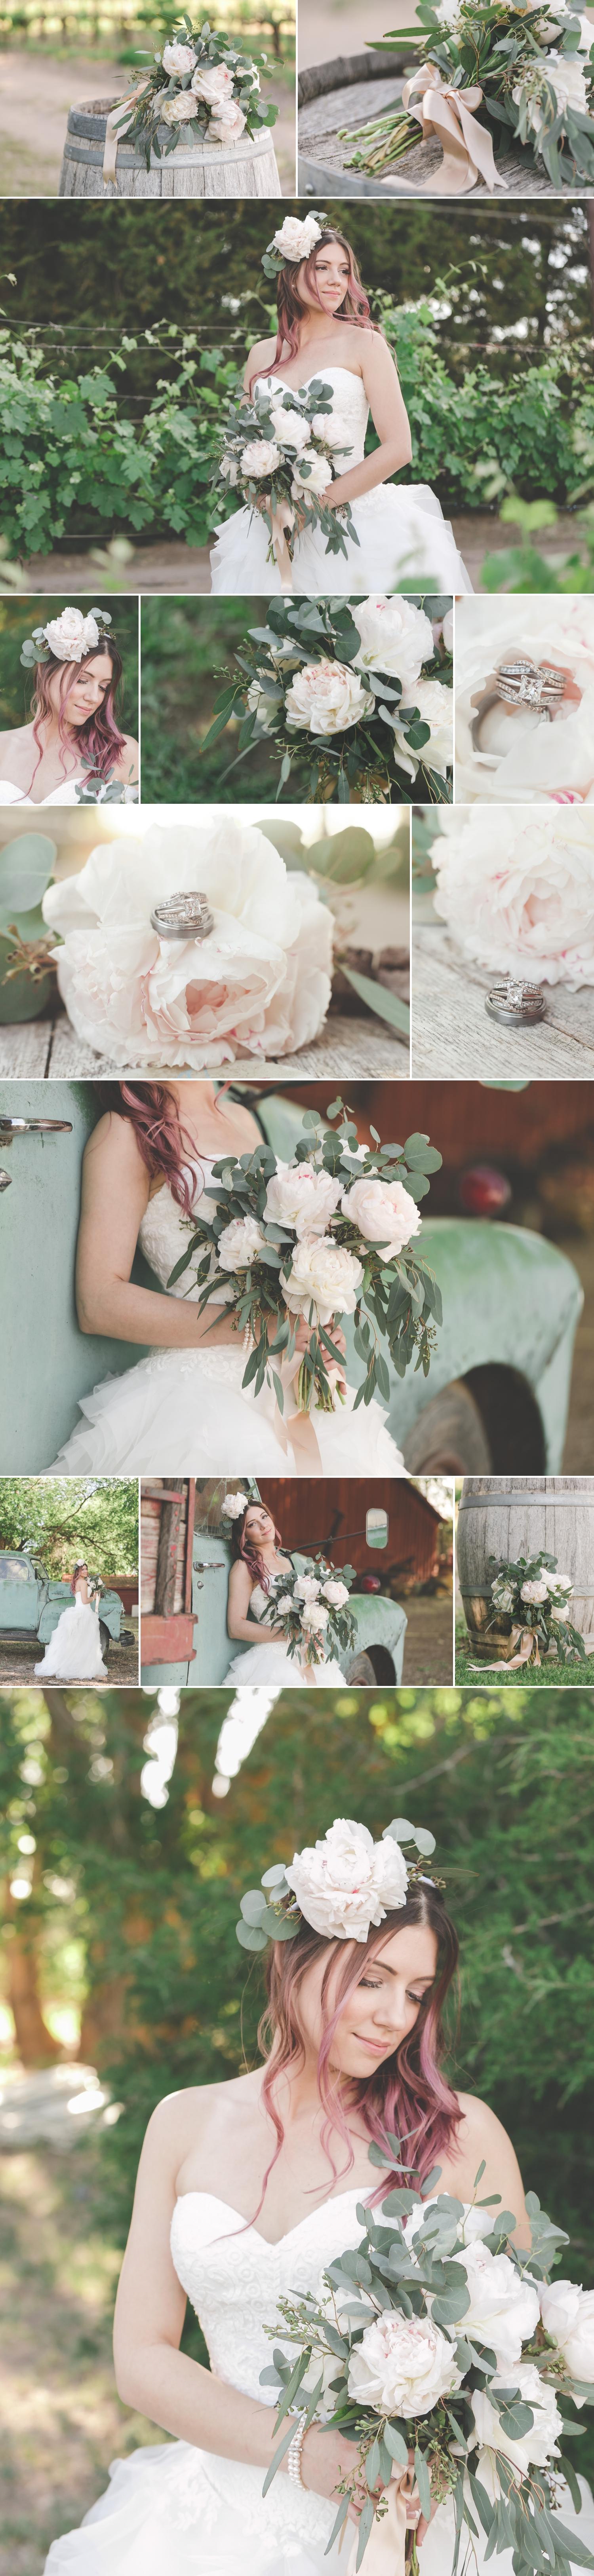 emery inman wedding 1.jpg